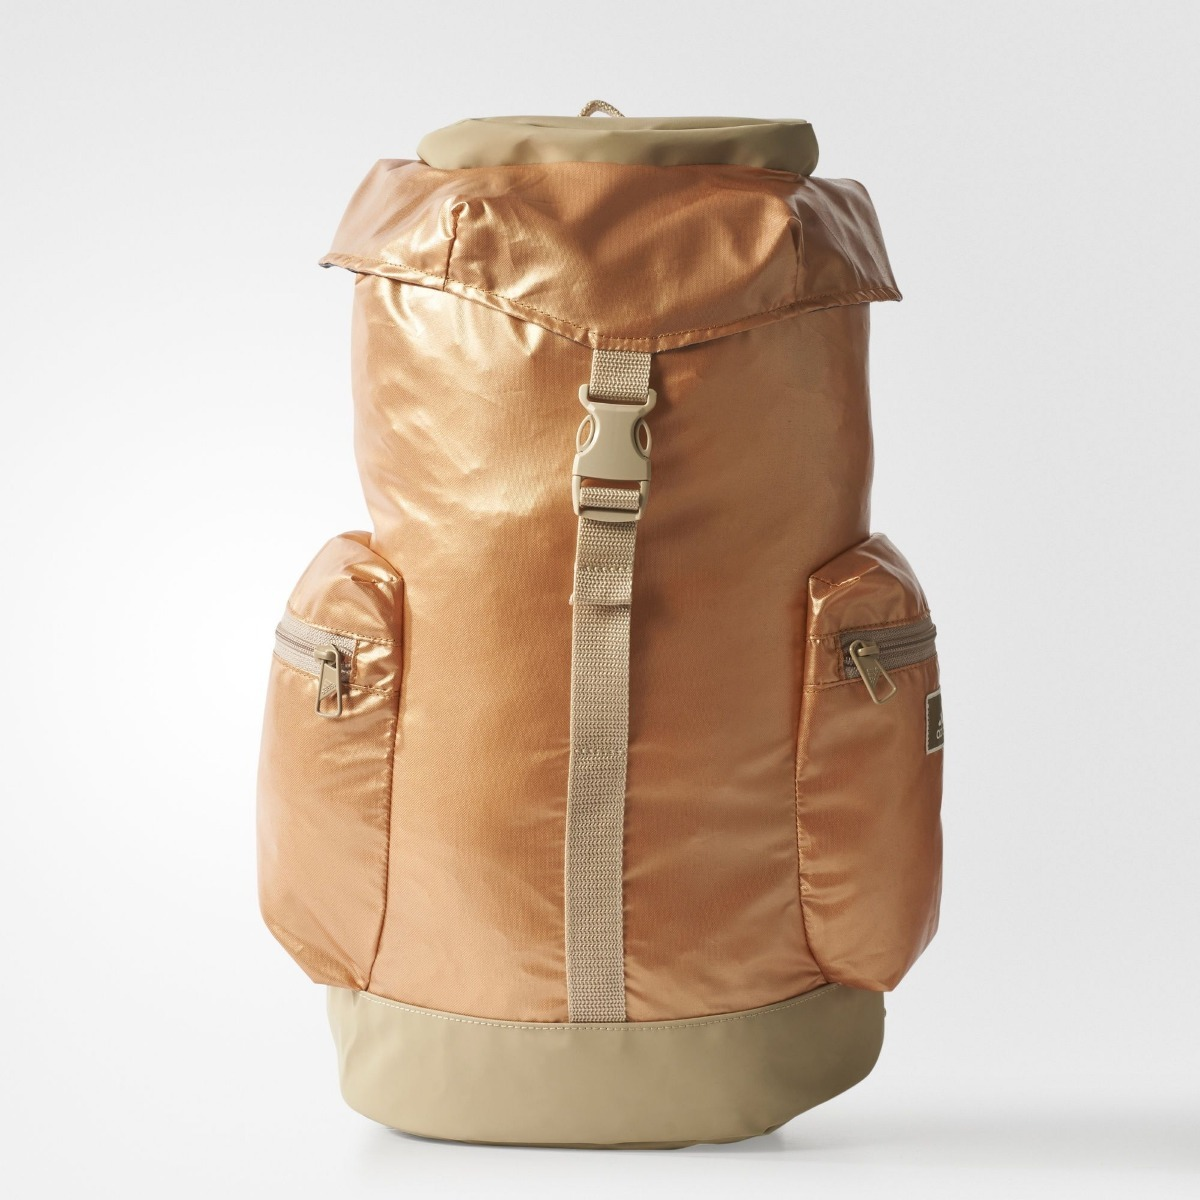 Adidas Backpack Shop Mochila Star Wars Originalsport pqUMVGSz